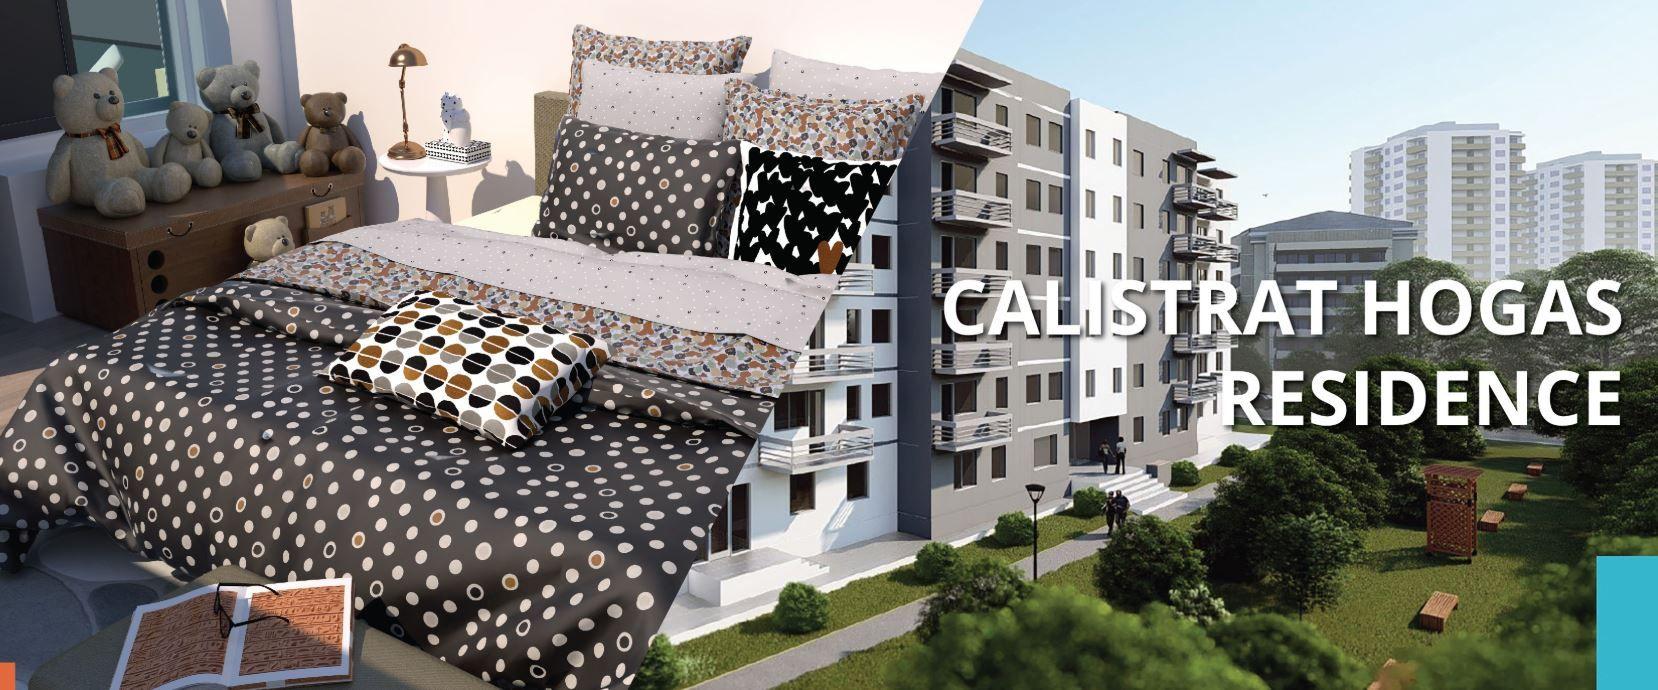 Calistrat Hogas 33-35